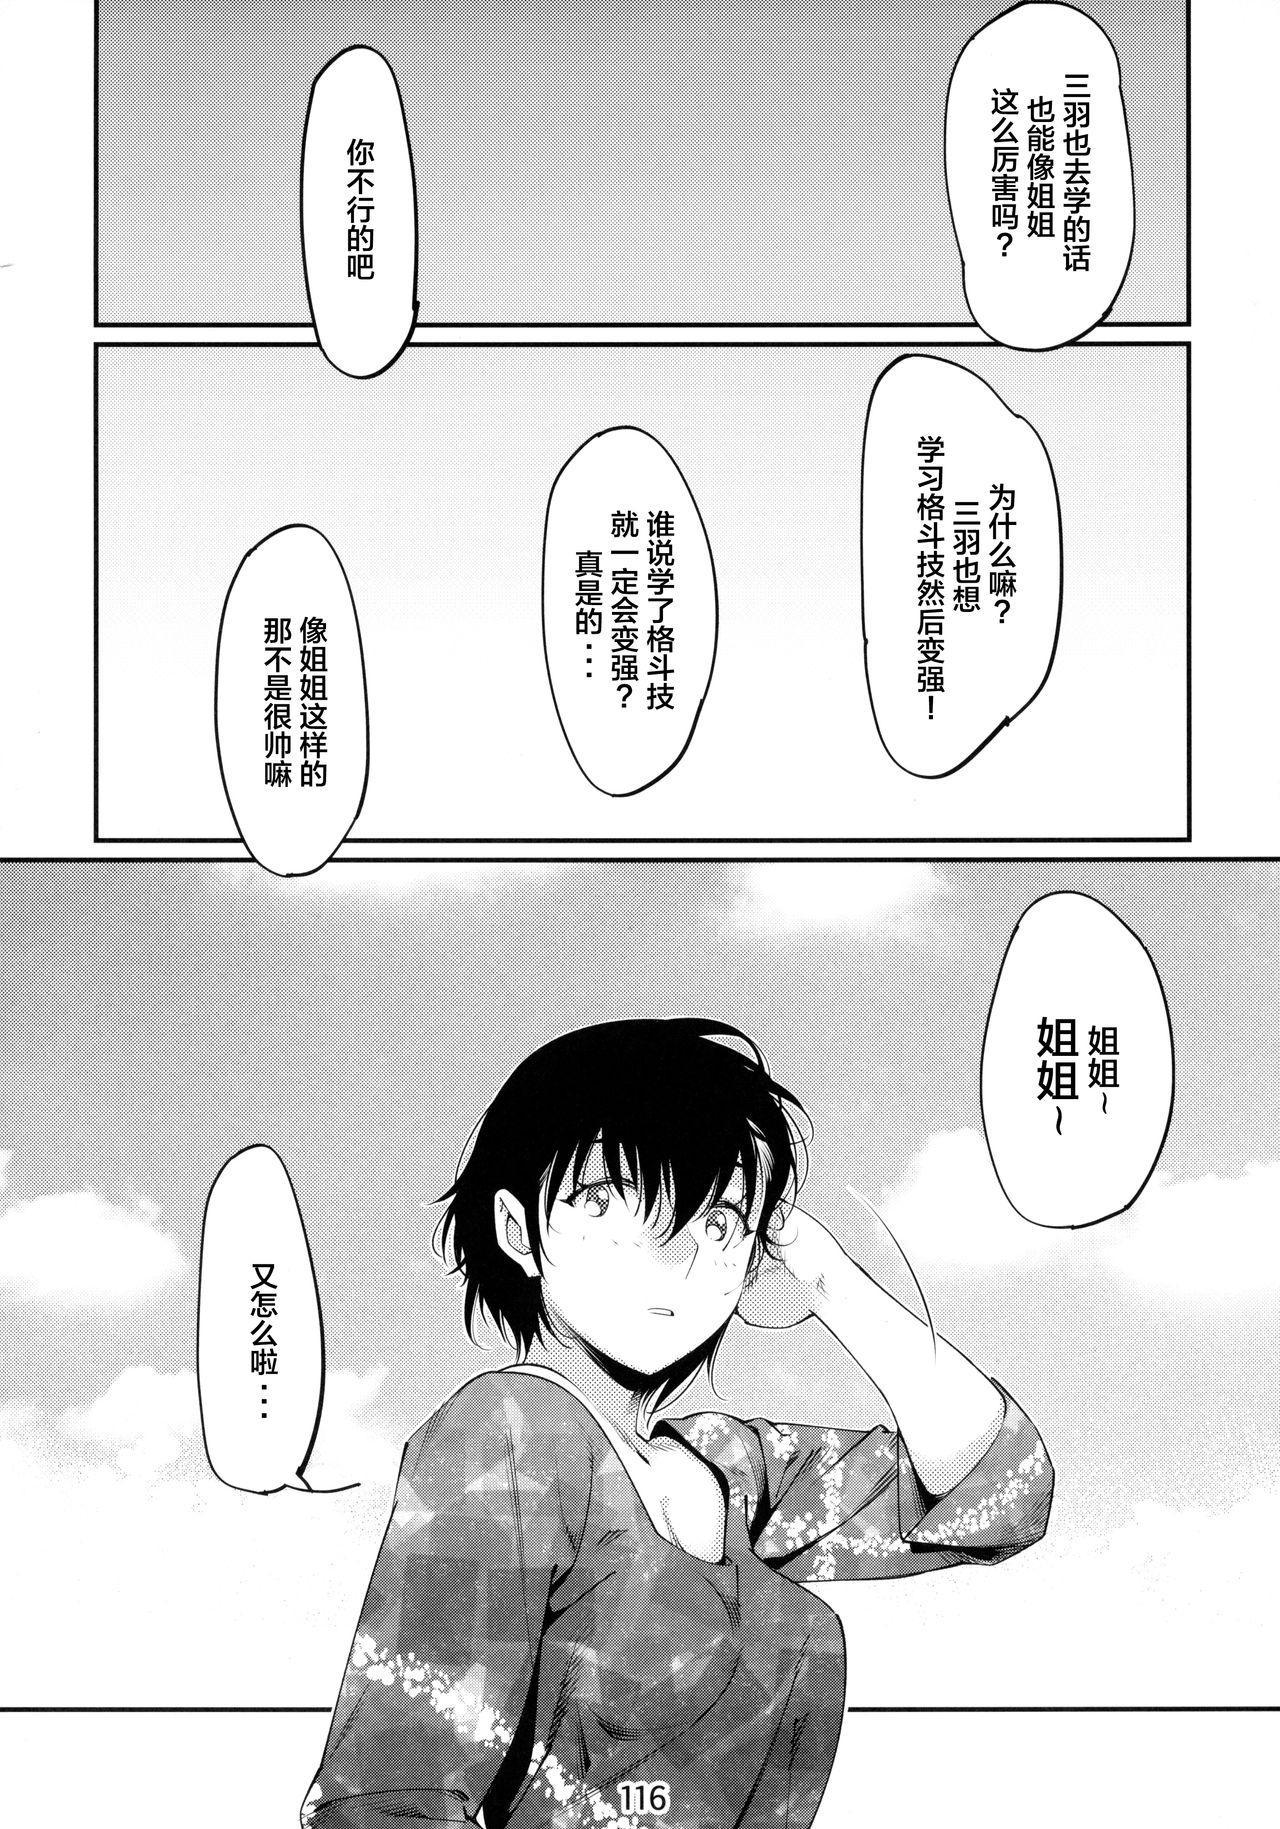 Otonano Omochiya 6 Kan 115